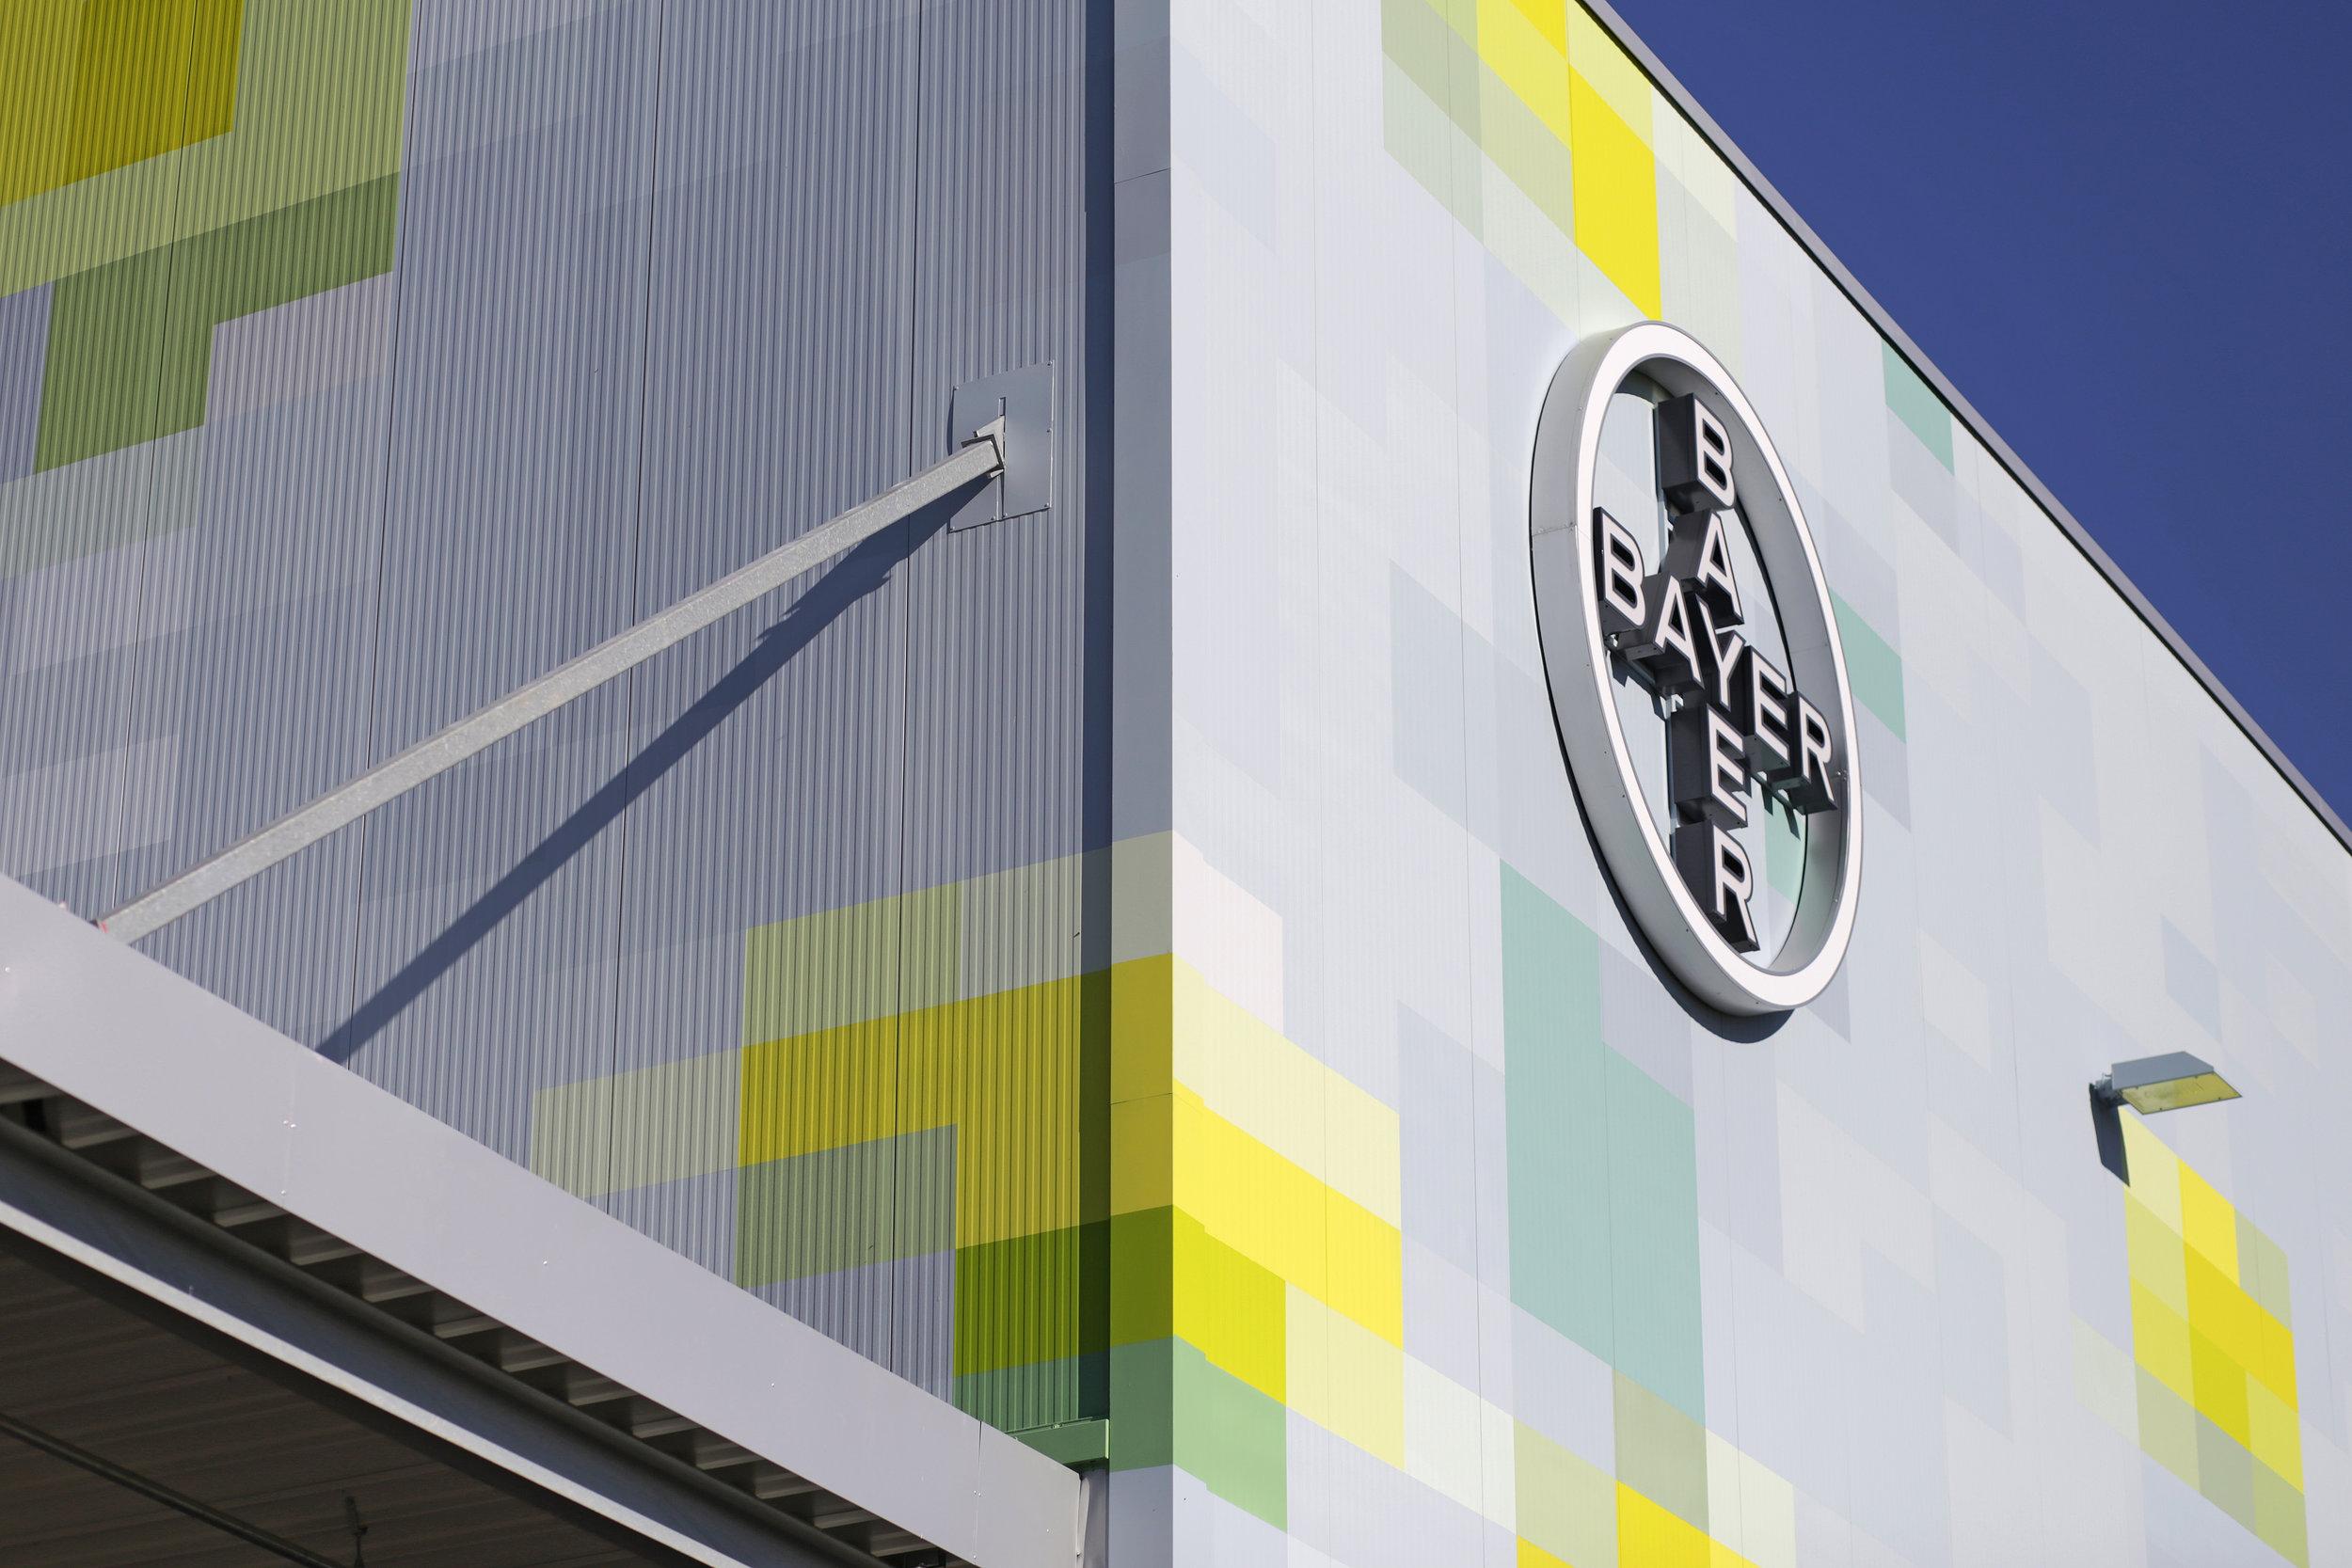 Wandmalerei-farbkonzept-werksgebäude